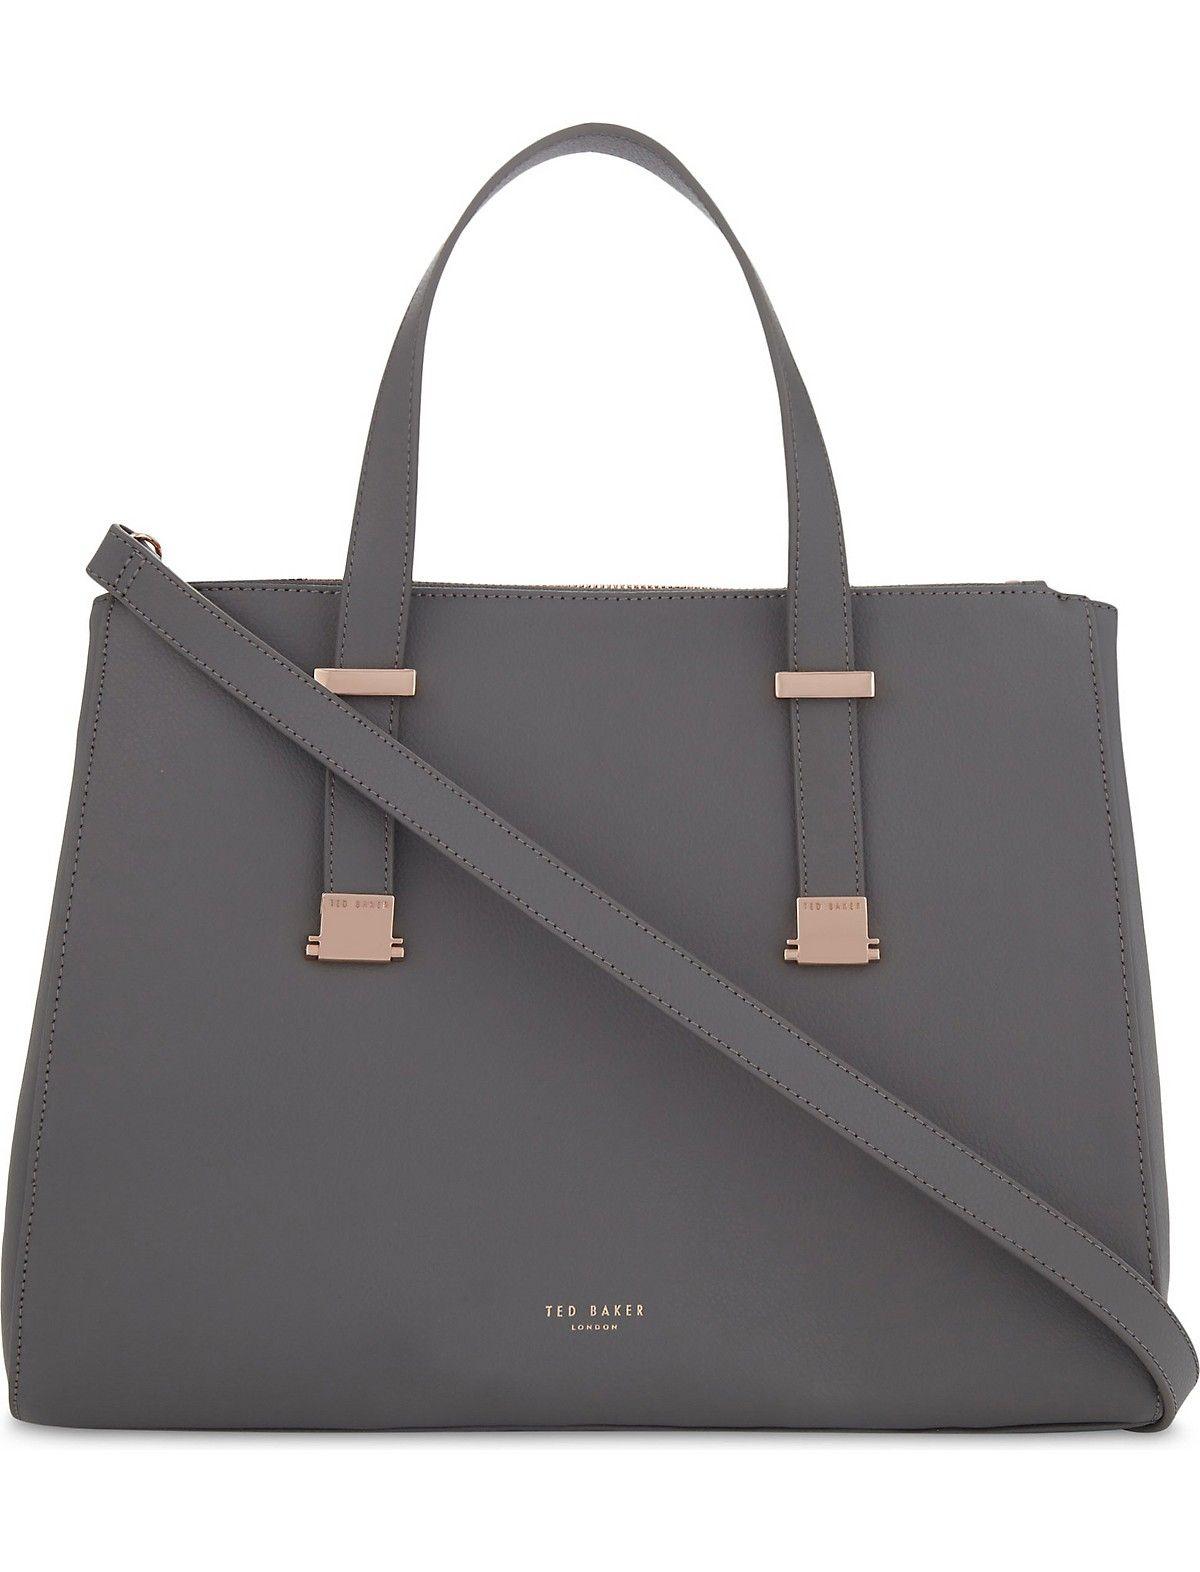 aed74f88f15e TED BAKER - Alunaa leather tote bag